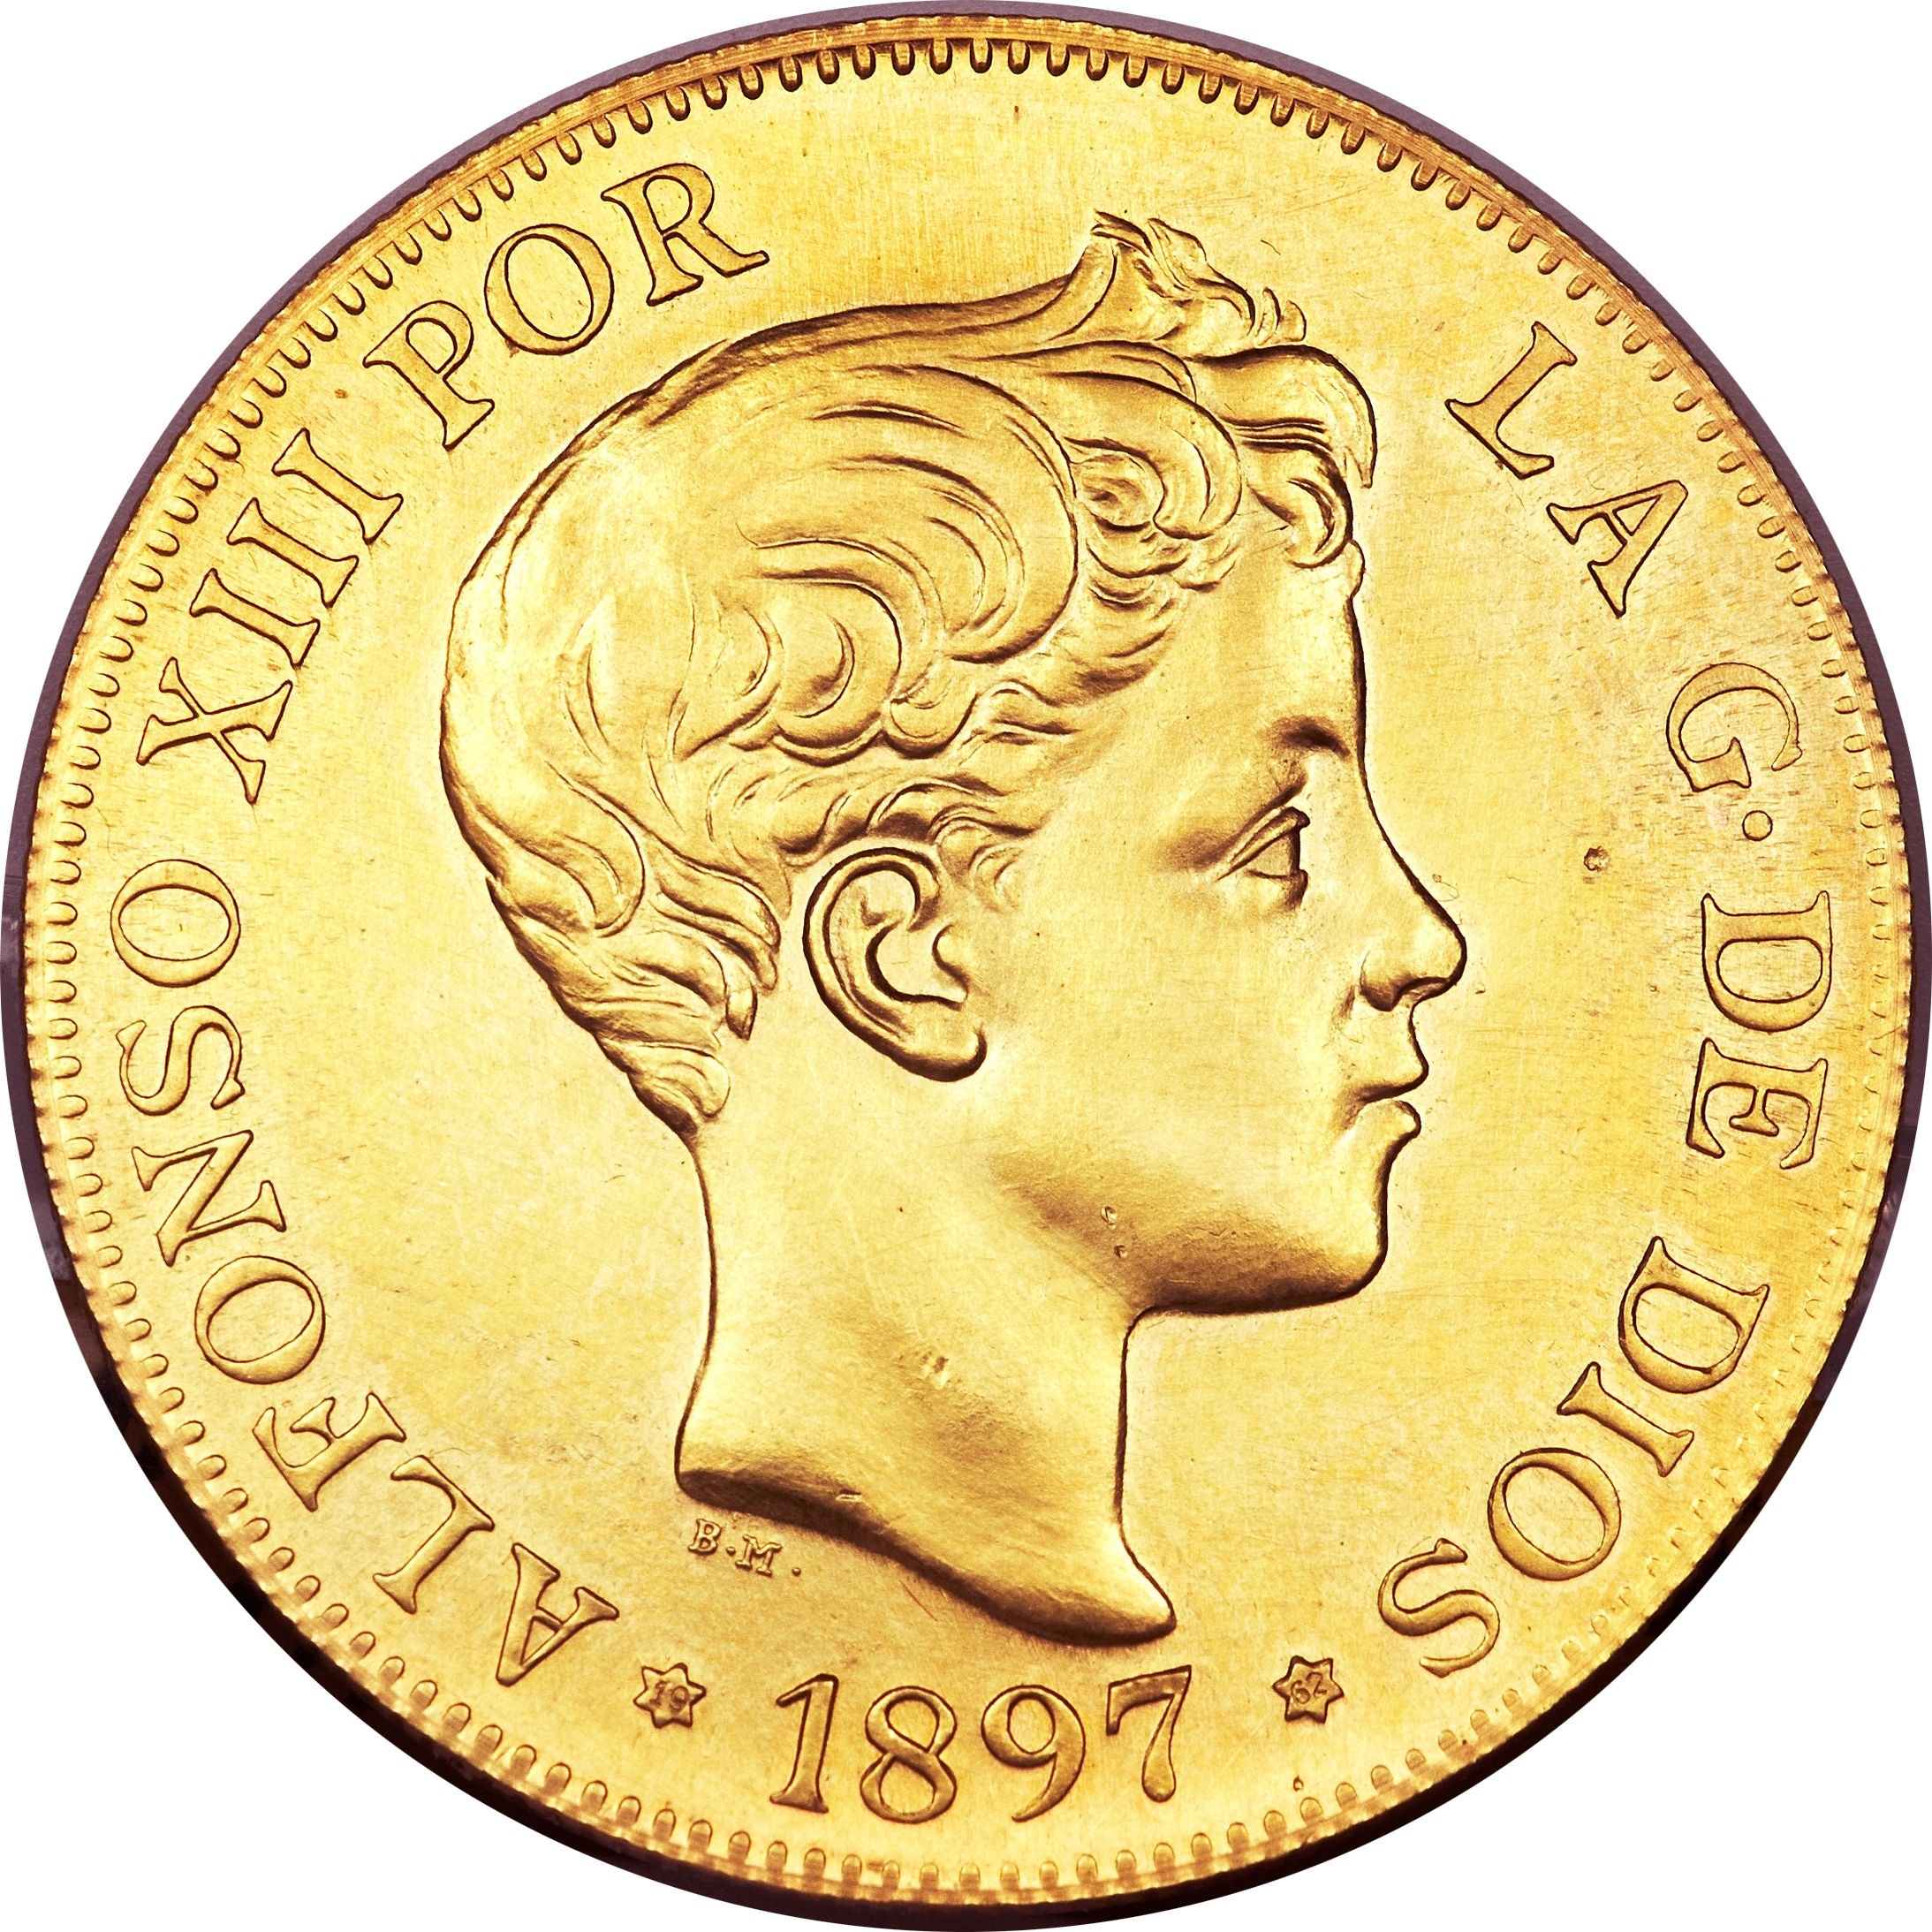 Spain 100 Pesetas (1897 Alfonso XIII)